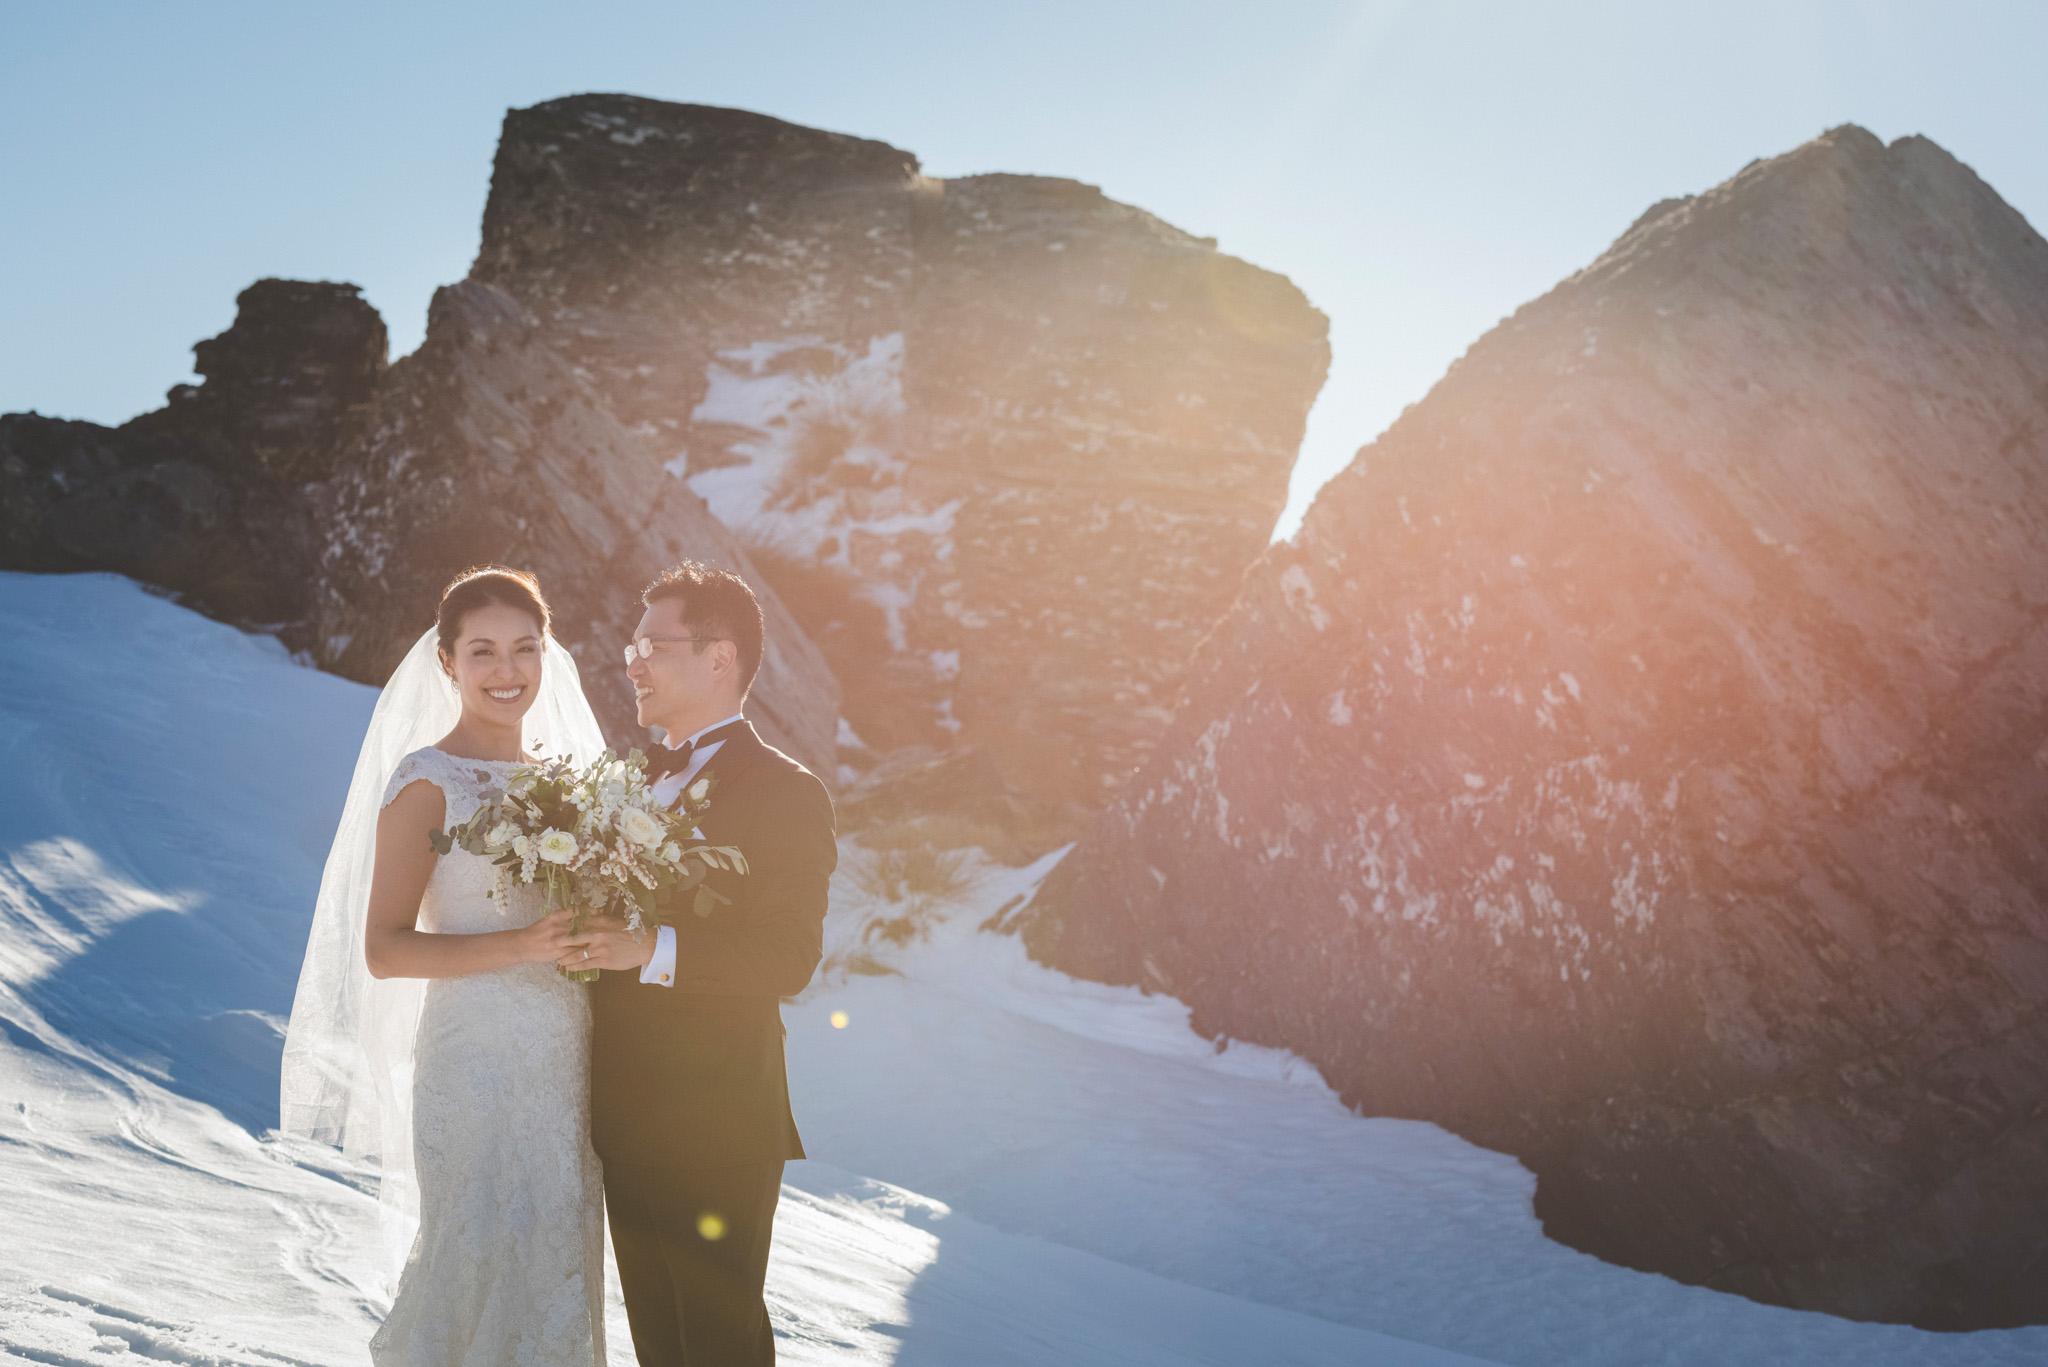 winter wedding heli photos at Cecil Peak